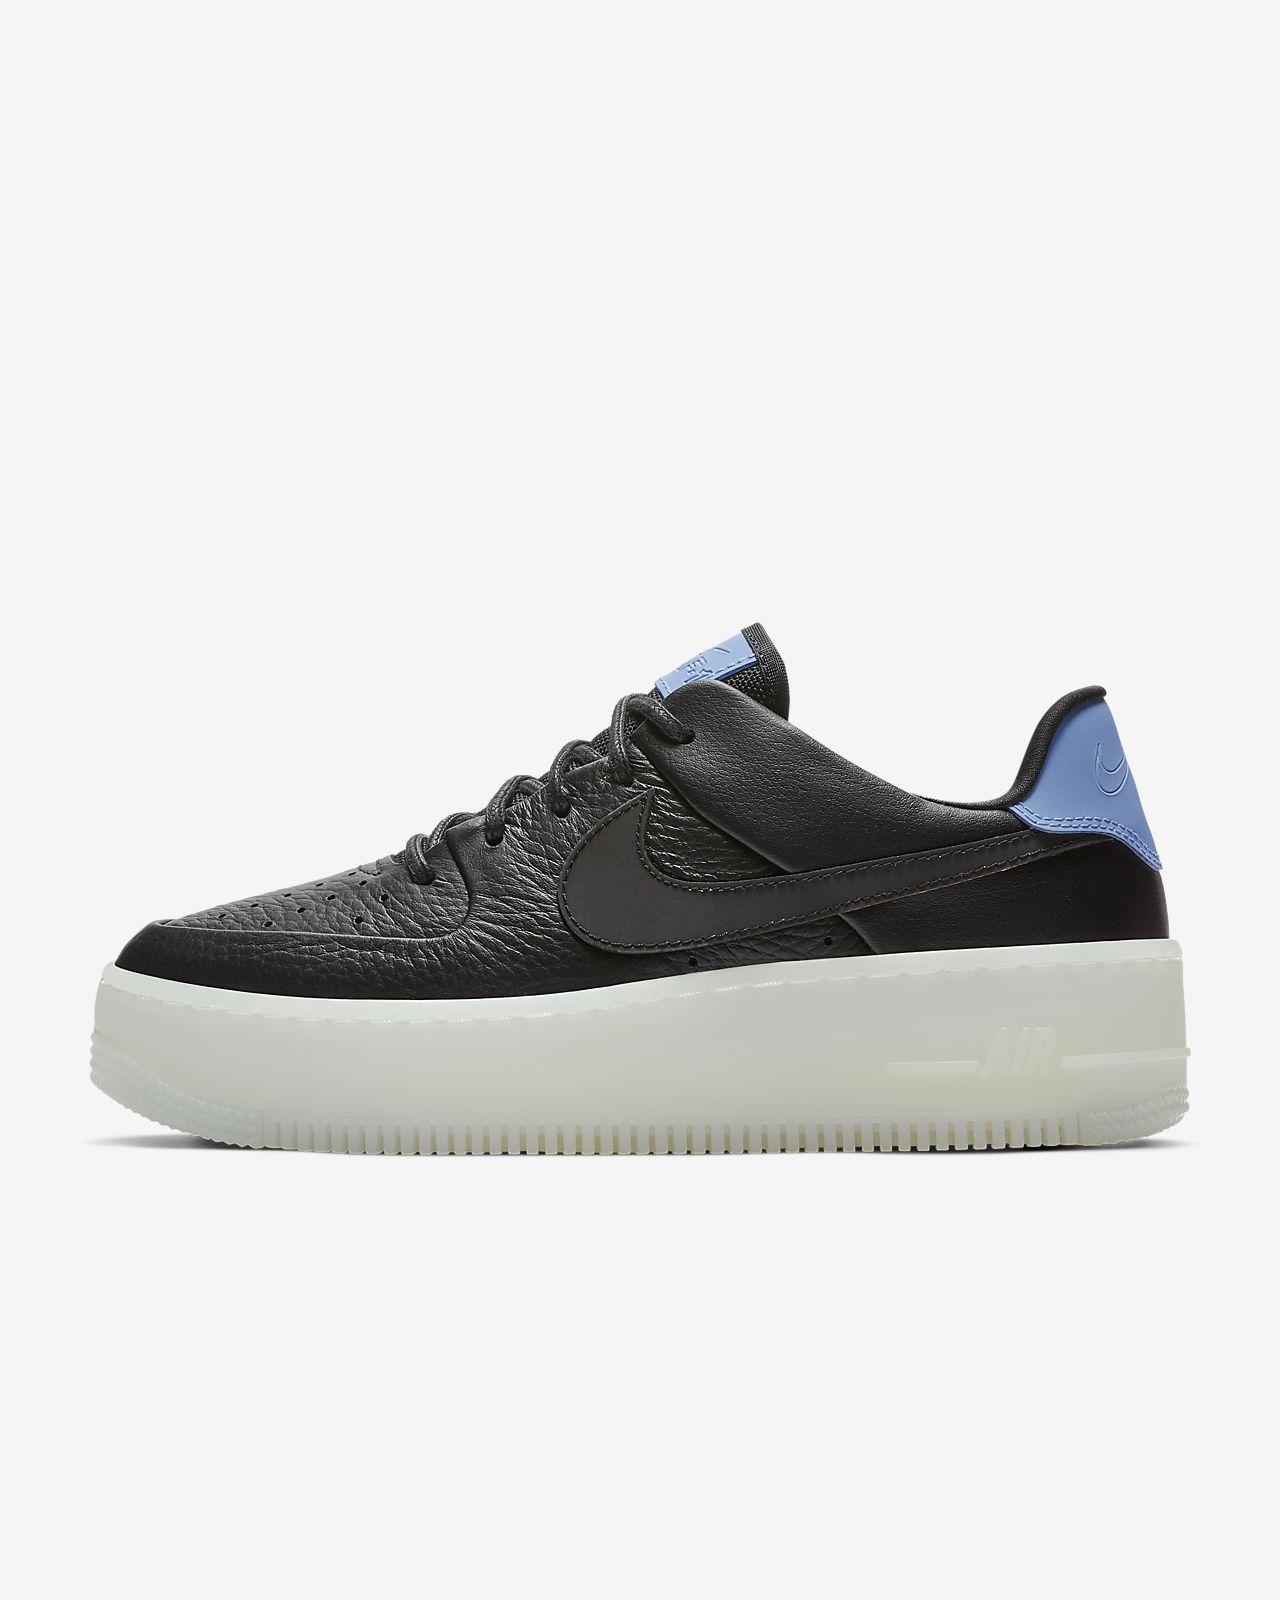 1de325dbfbff6 Calzado para mujer Nike Air Force 1 Sage Low LX. Nike.com MX